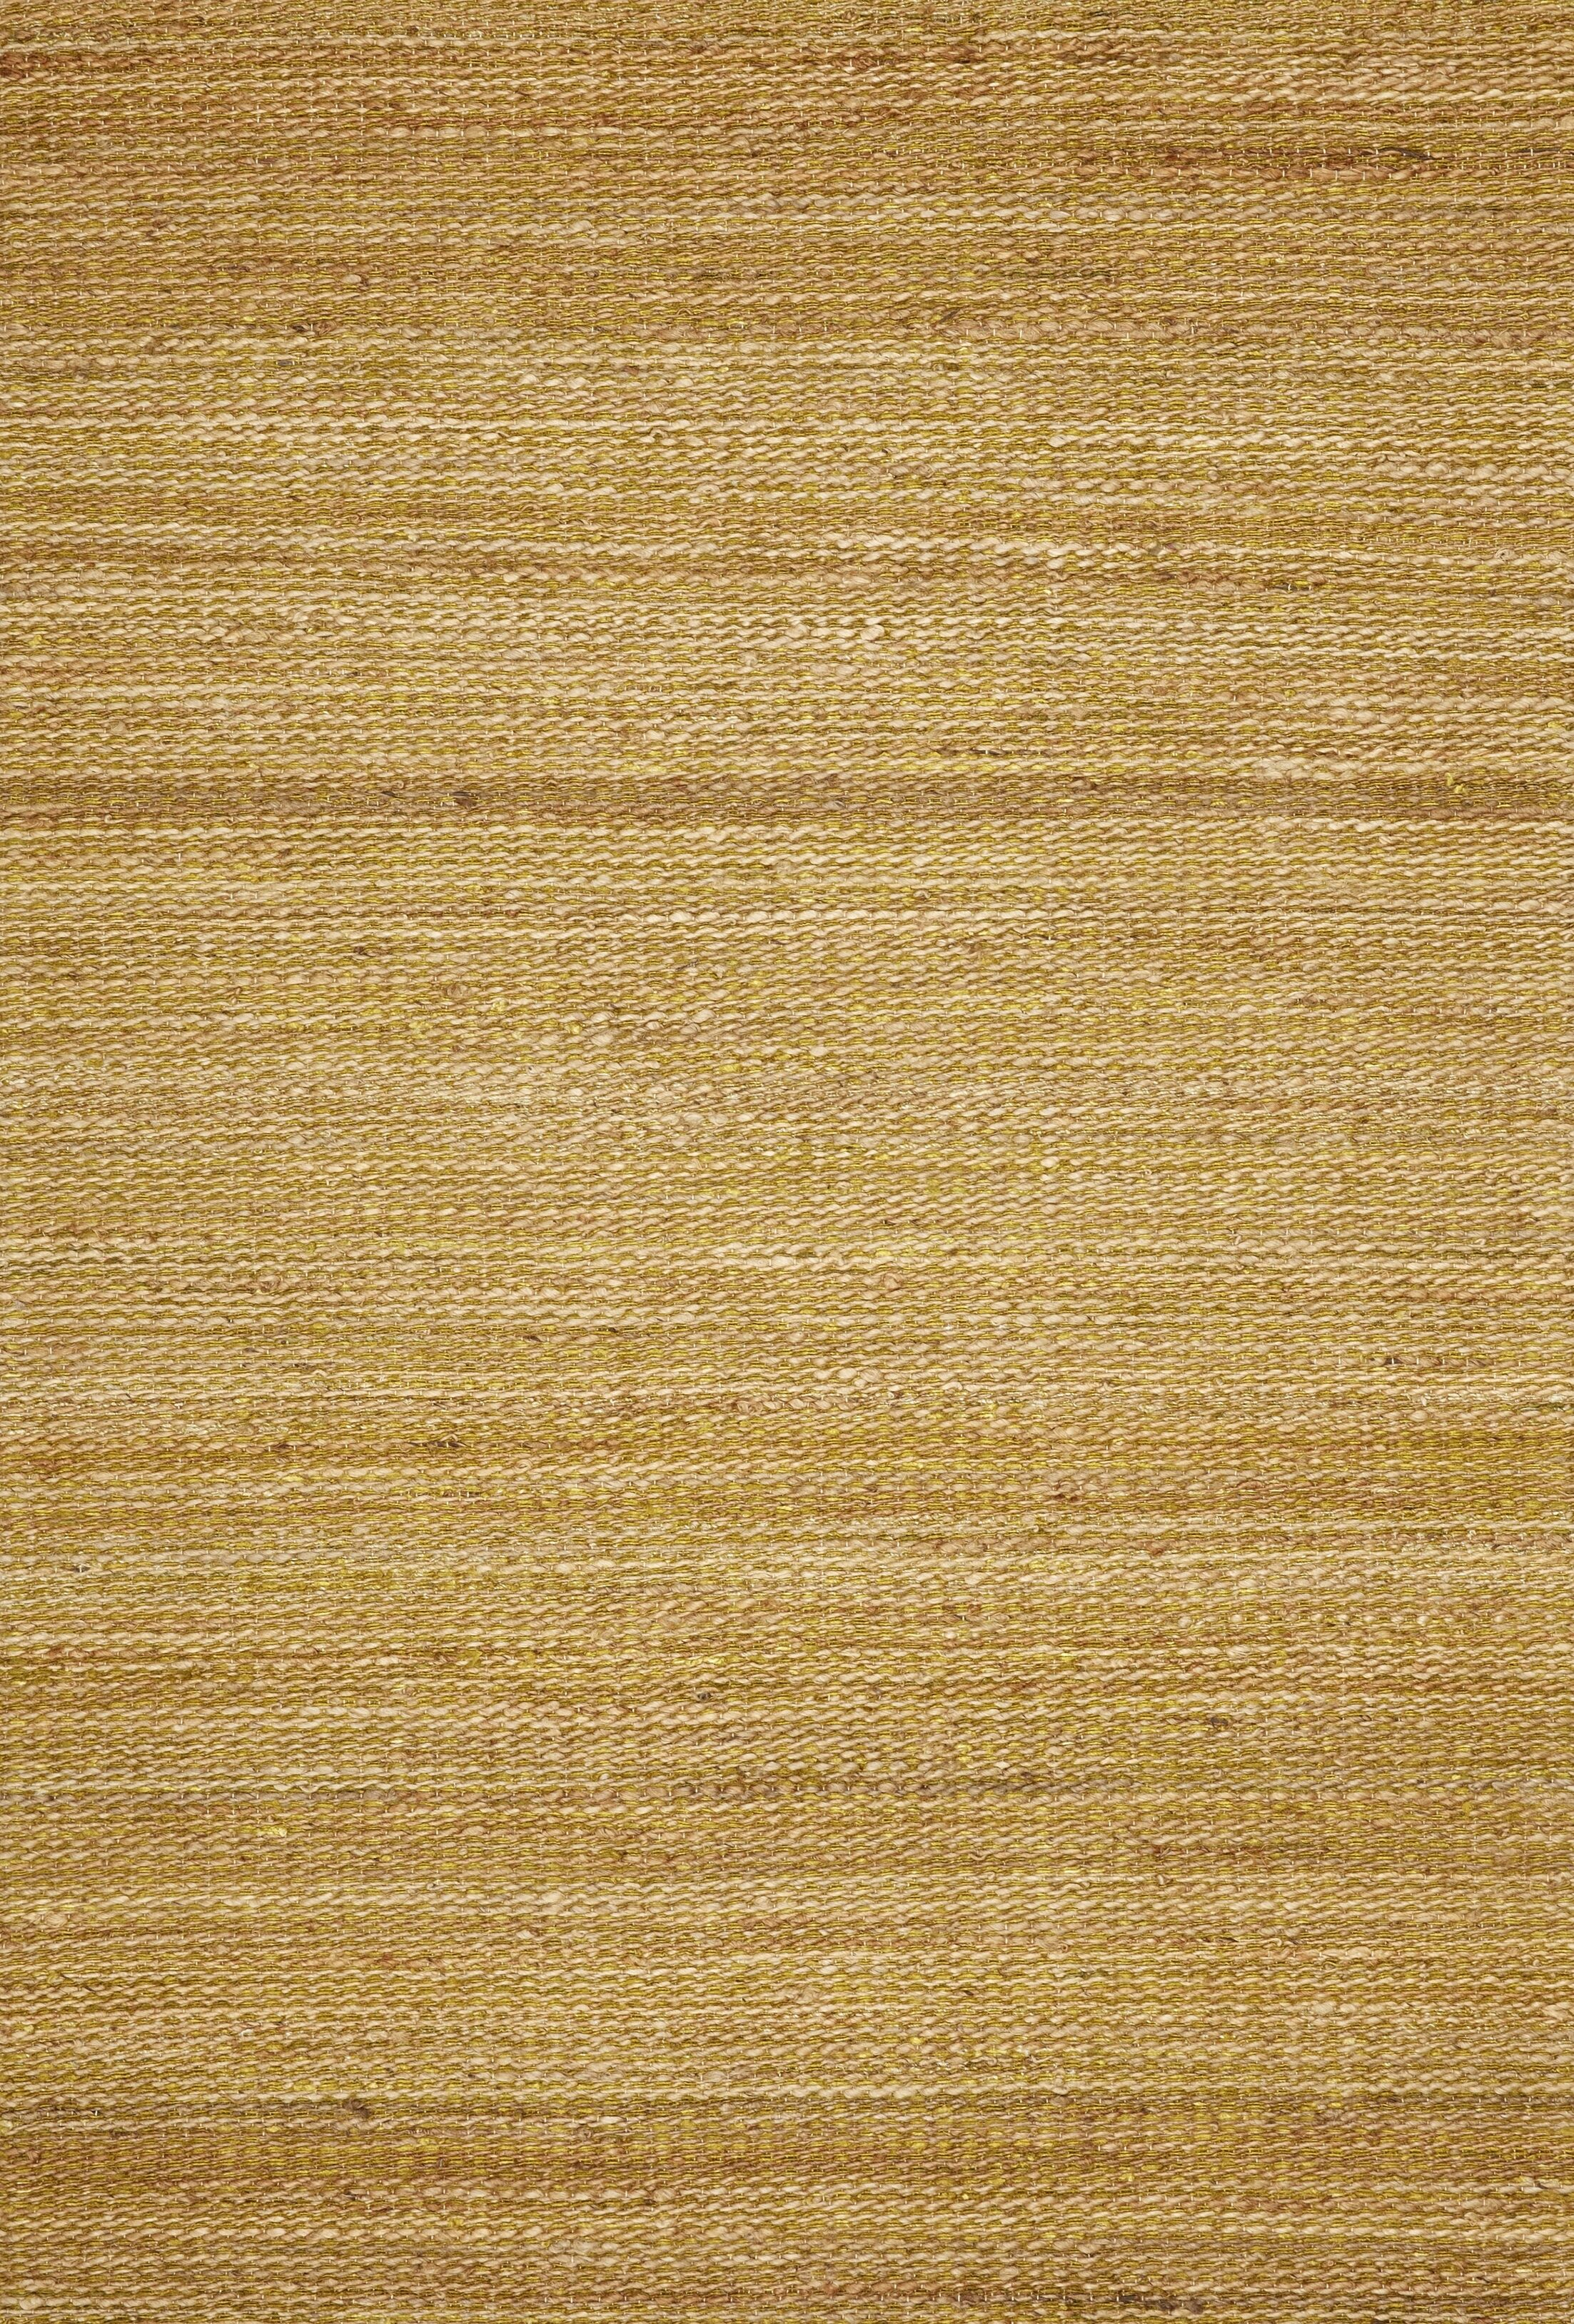 Dulce Avocado Area Rug Rug Size: Rectangle 5' x 7'6